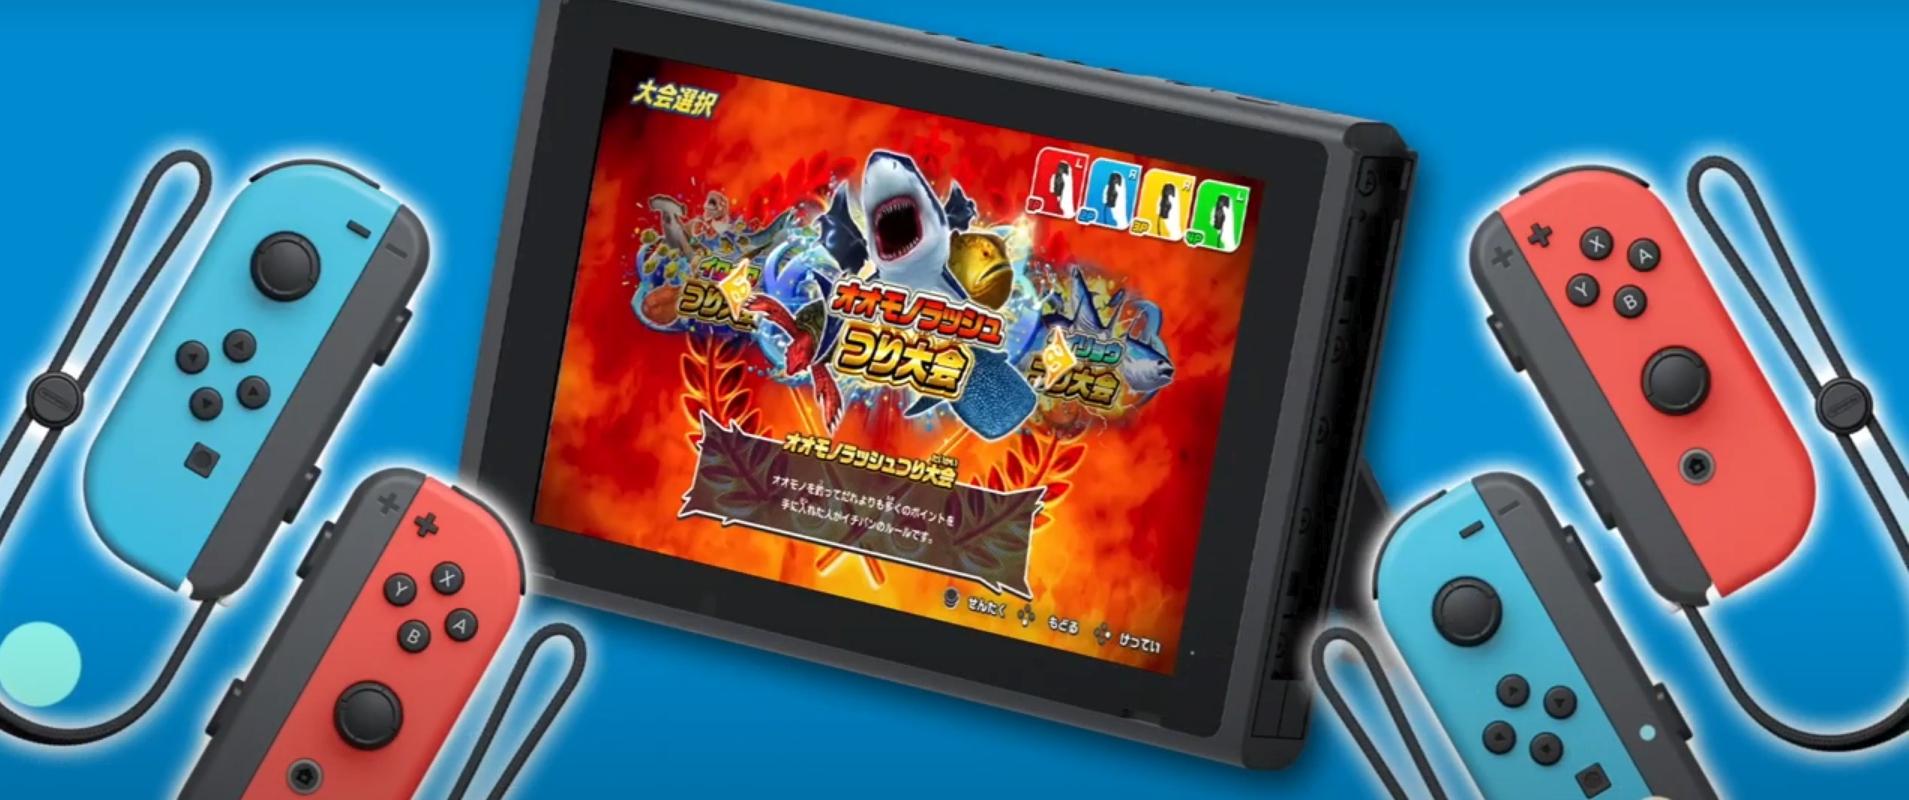 Bandai Namco's Fishing Spirits To Get English Release As Ace Angler